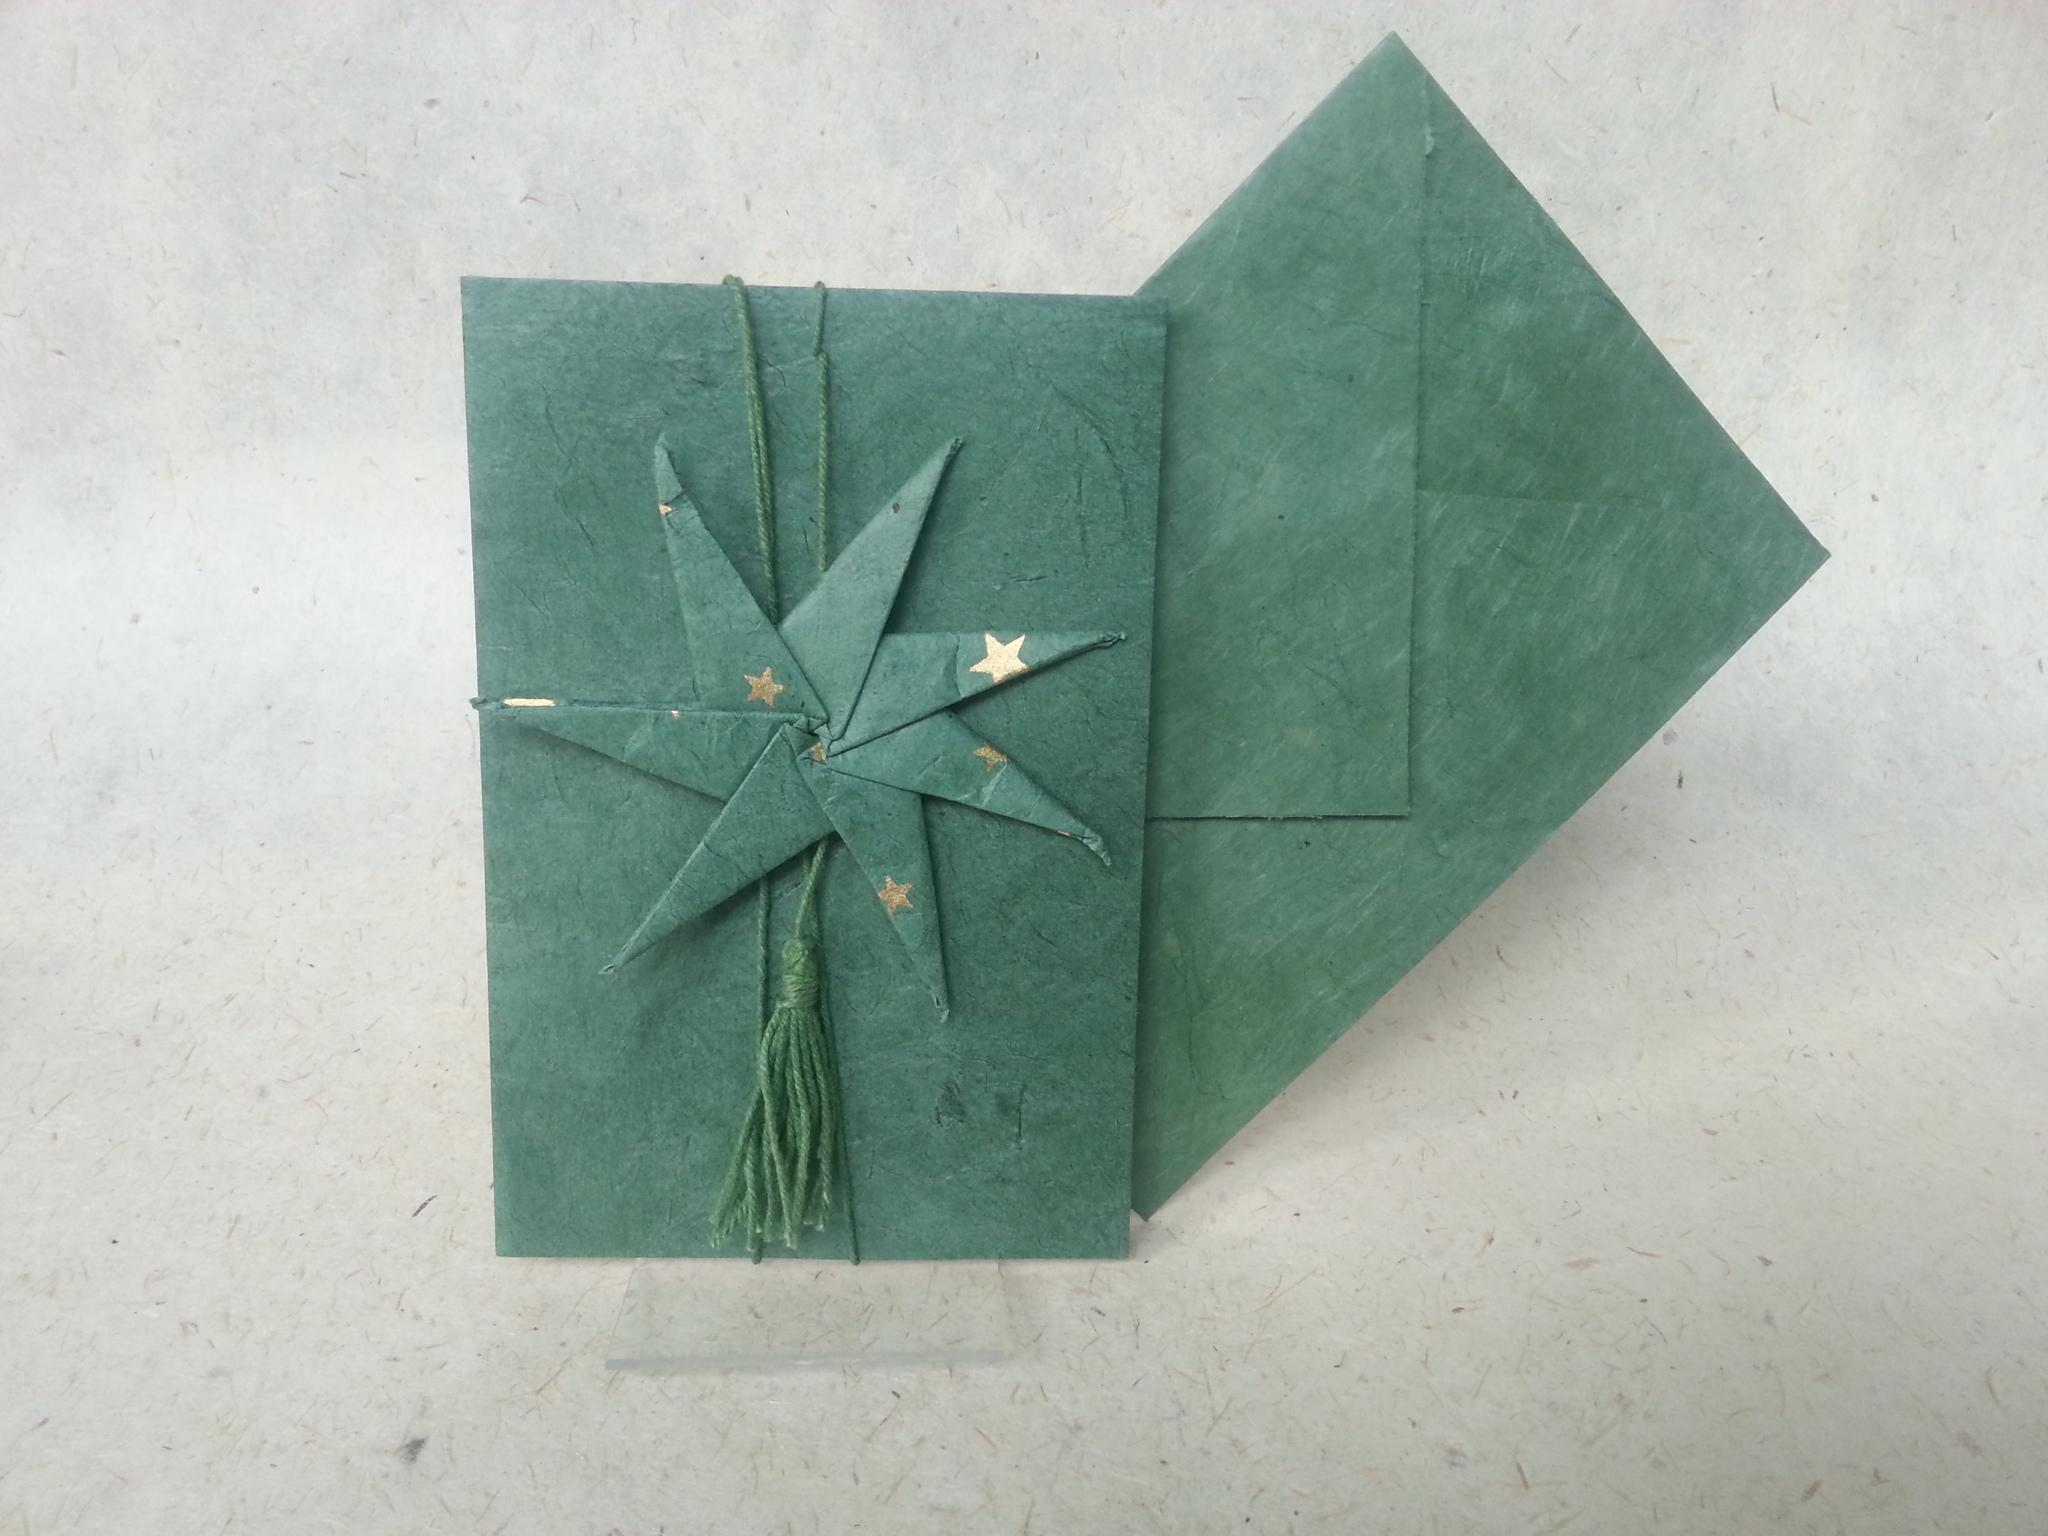 Faltkarte mit Stern am Faden